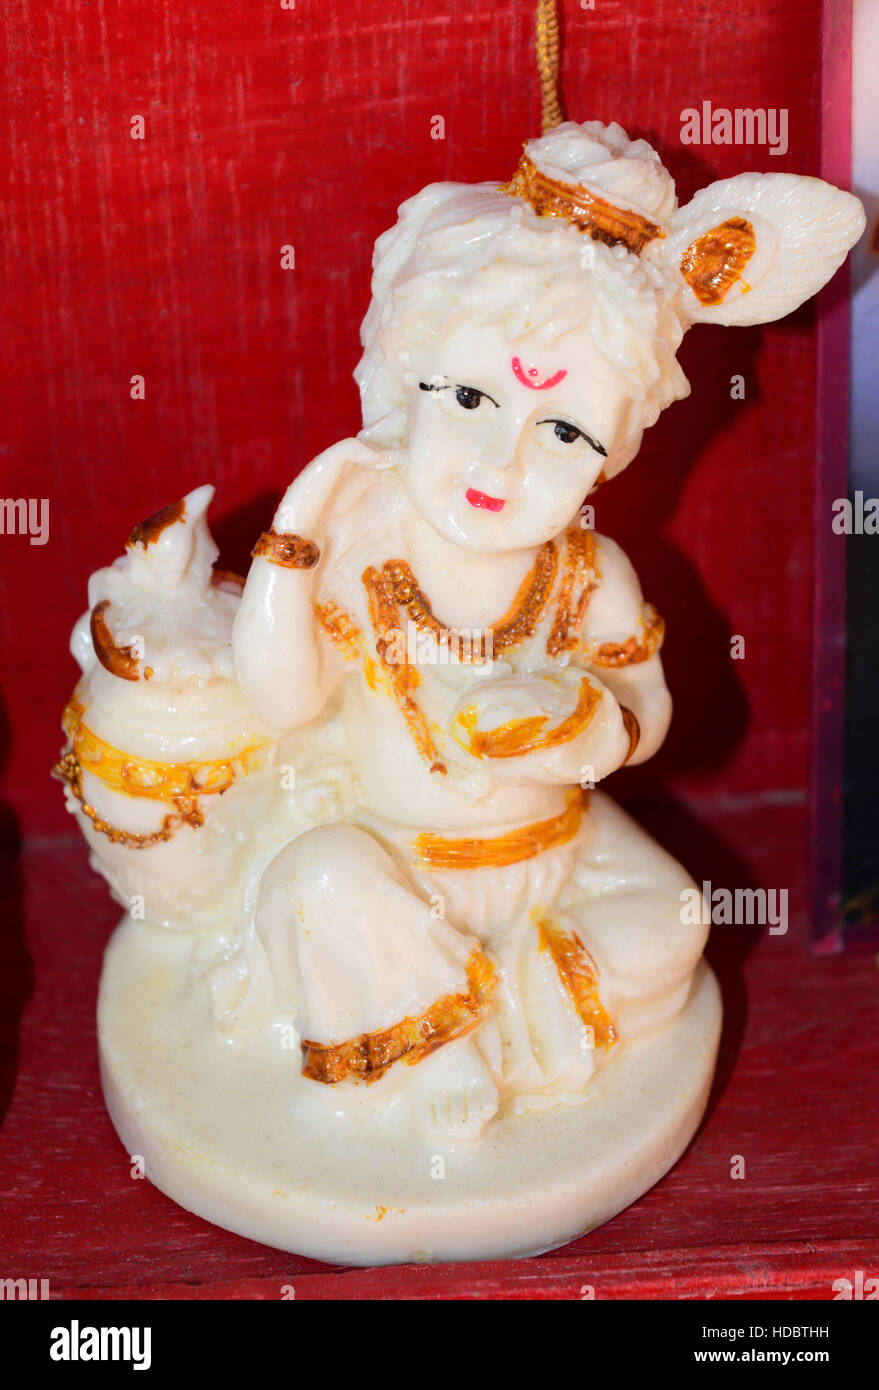 Child Krishna holding Butter Beautiful Handcrafts Statue India - Stock Image